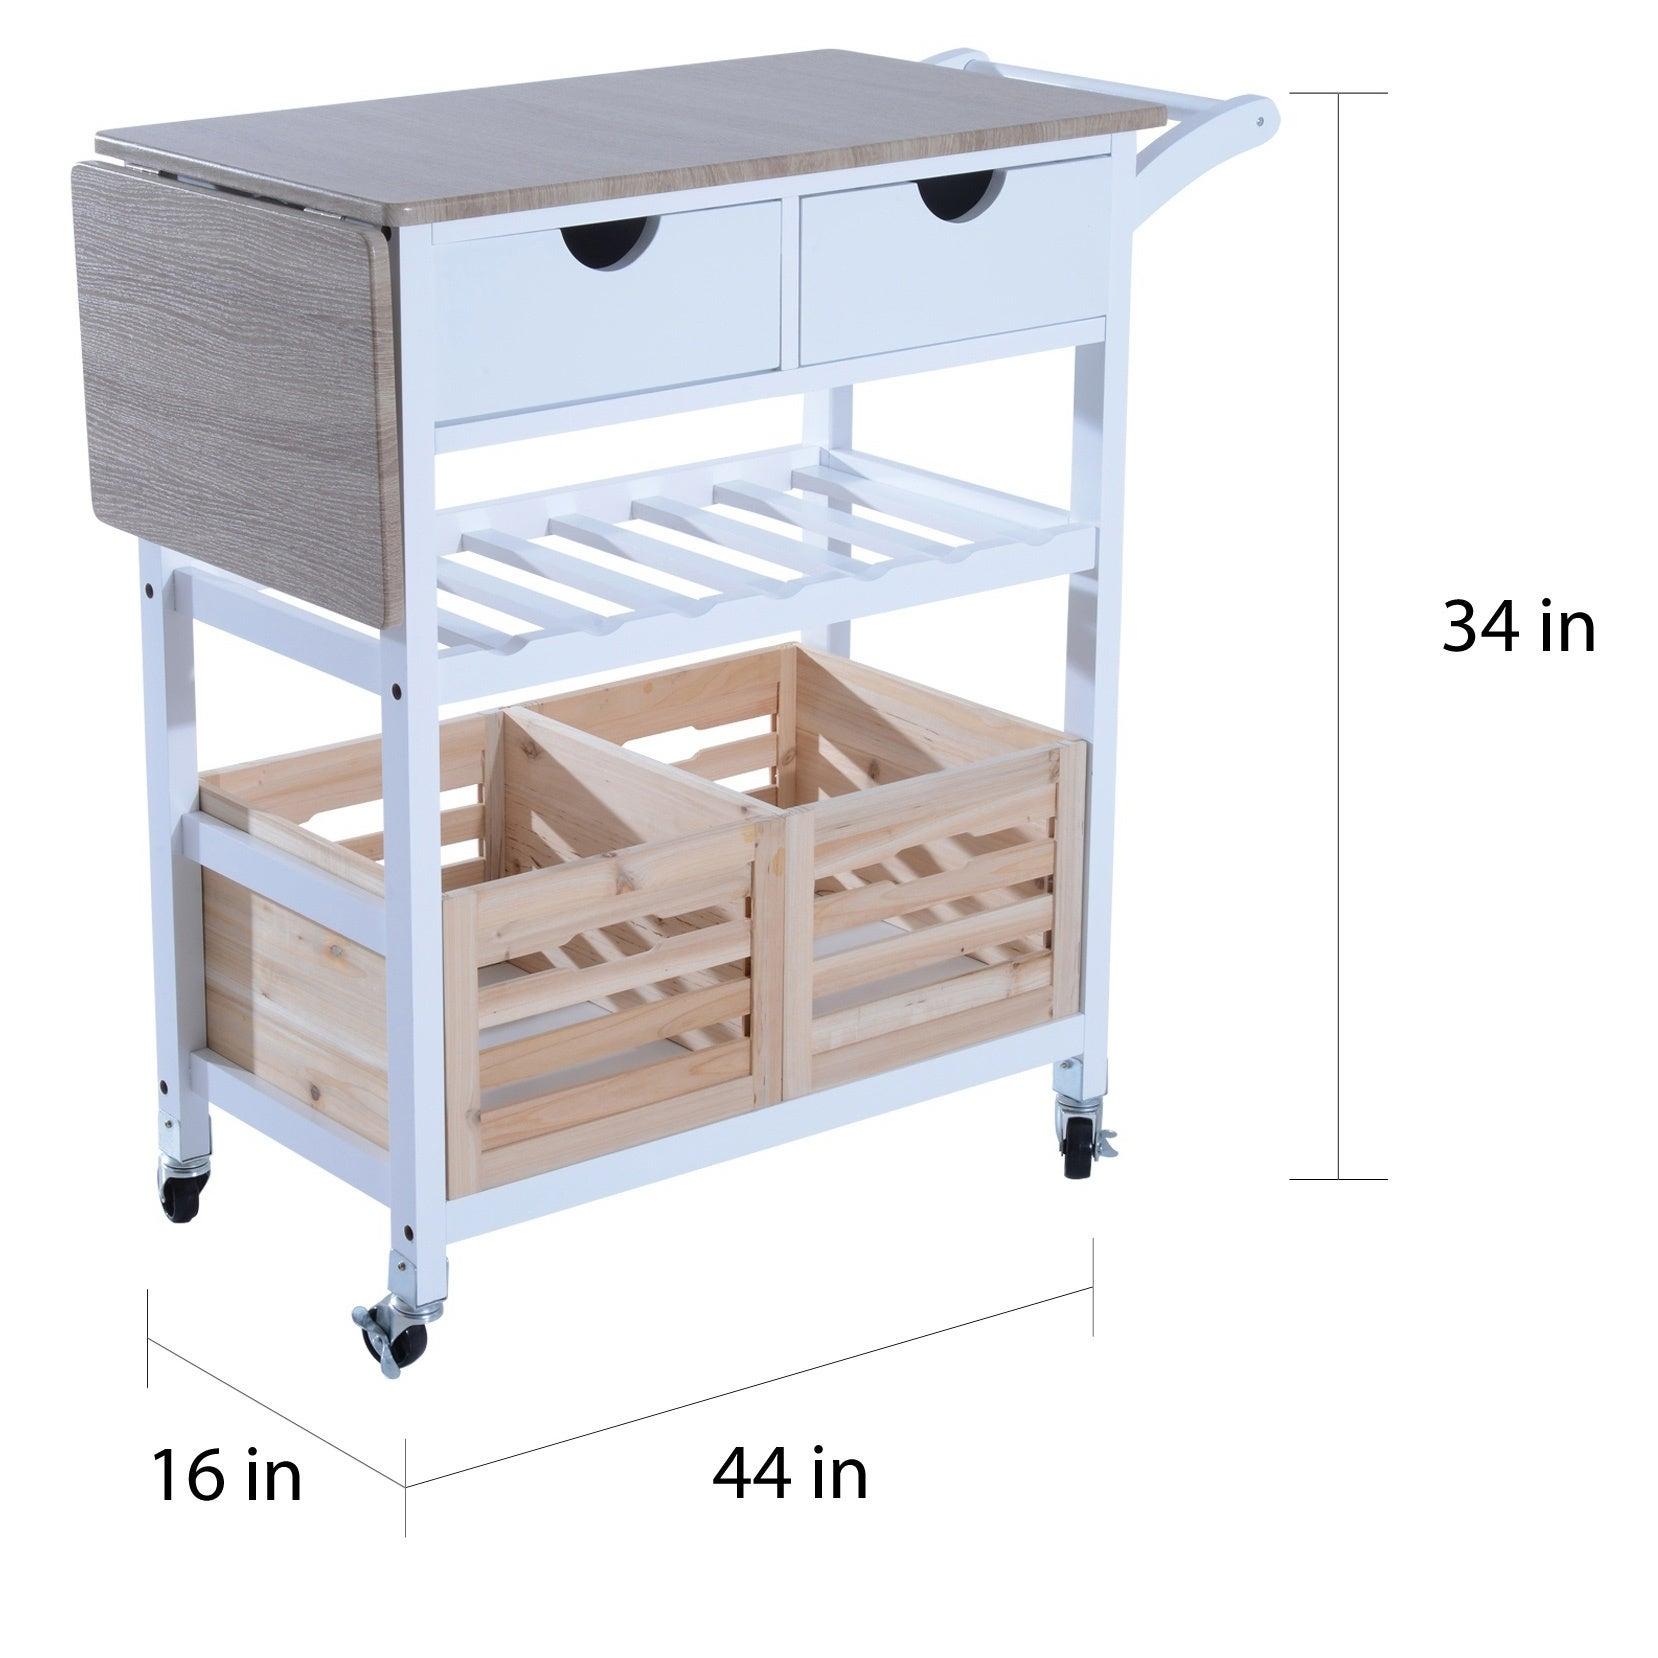 Homcom 34 Rolling Drop Leaf Kitchen Trolley Serving Cart With Wine Rack